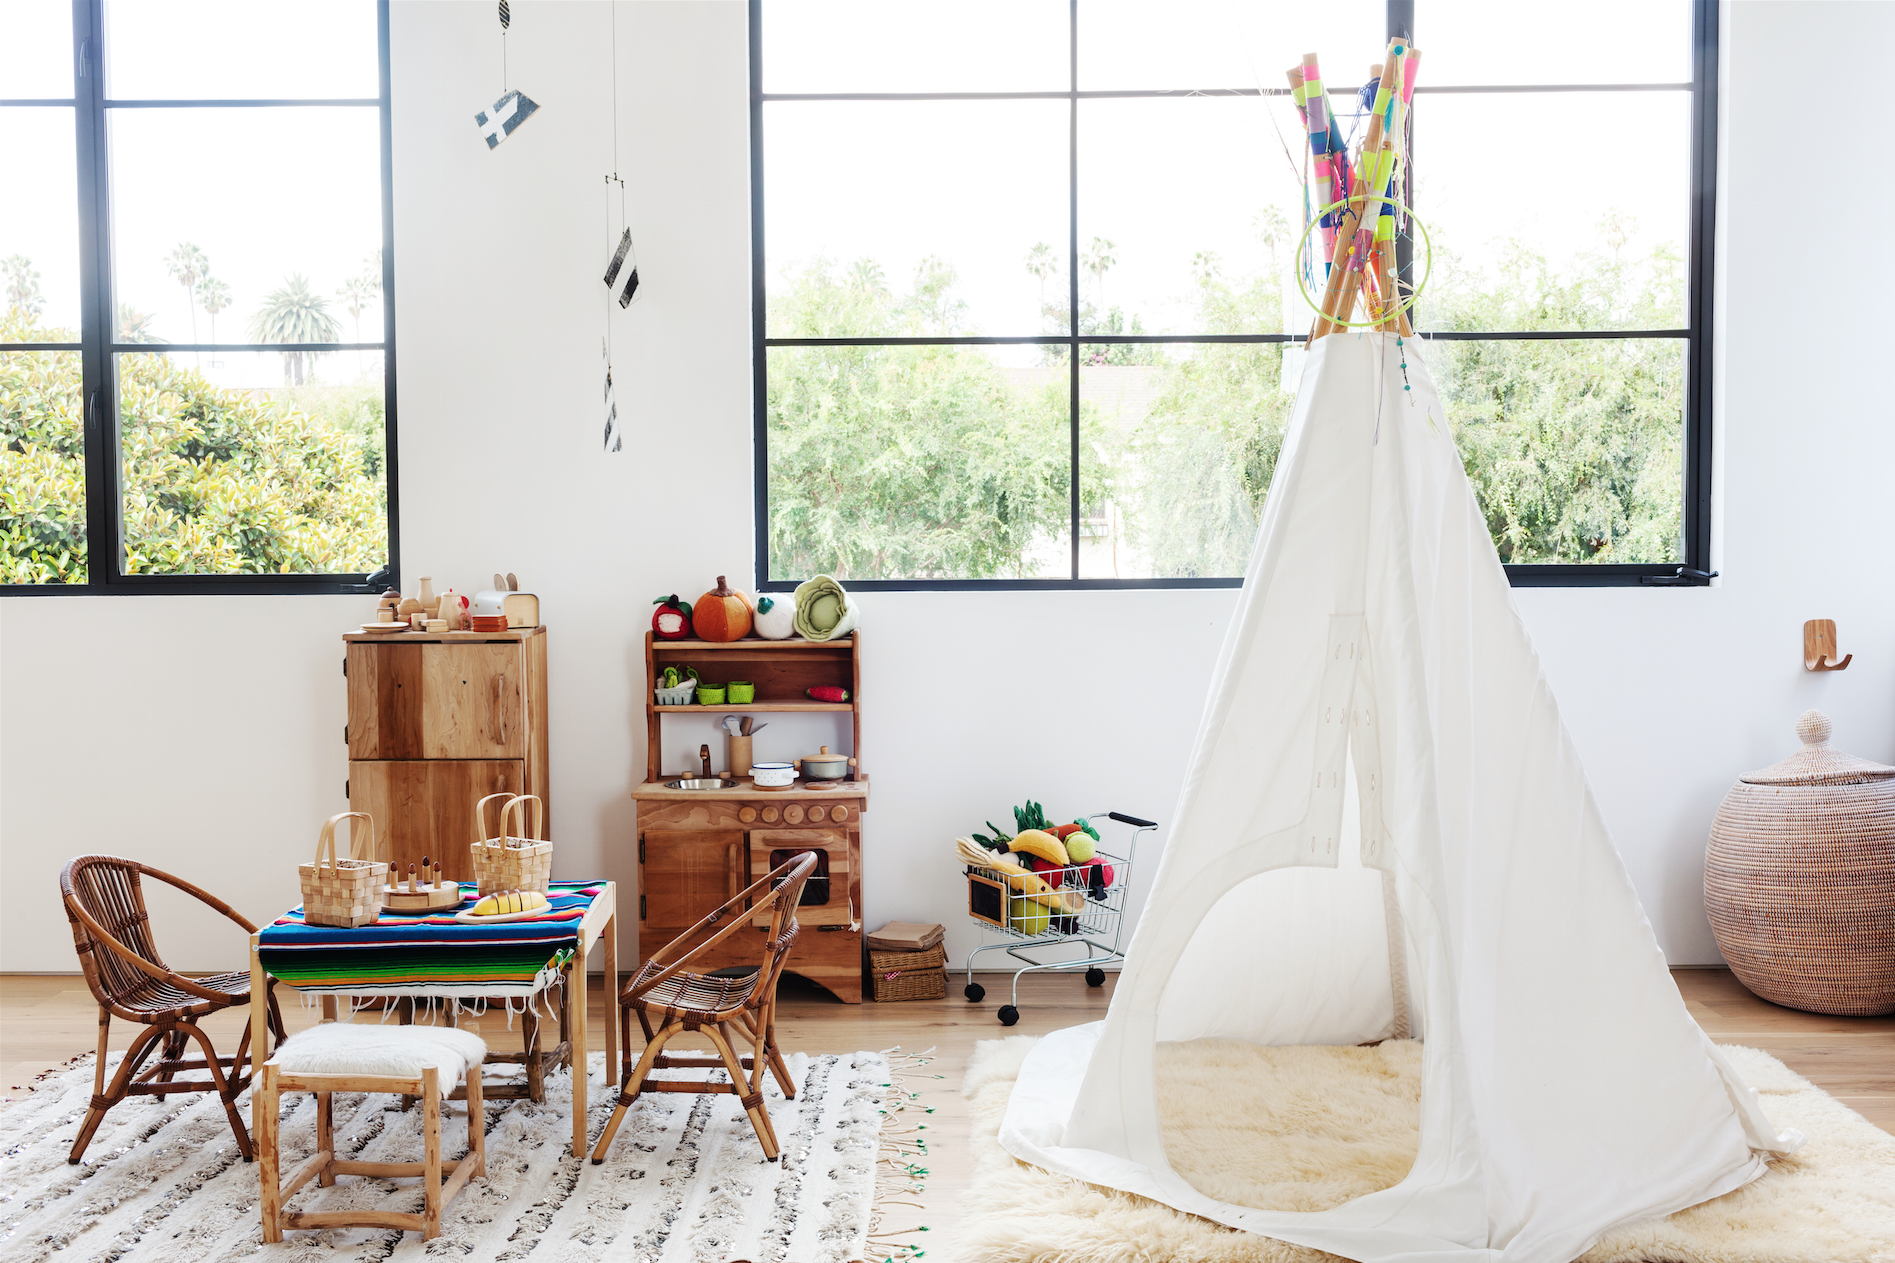 Tour Designer Jenni Kayne's Rustic and Airy Abode